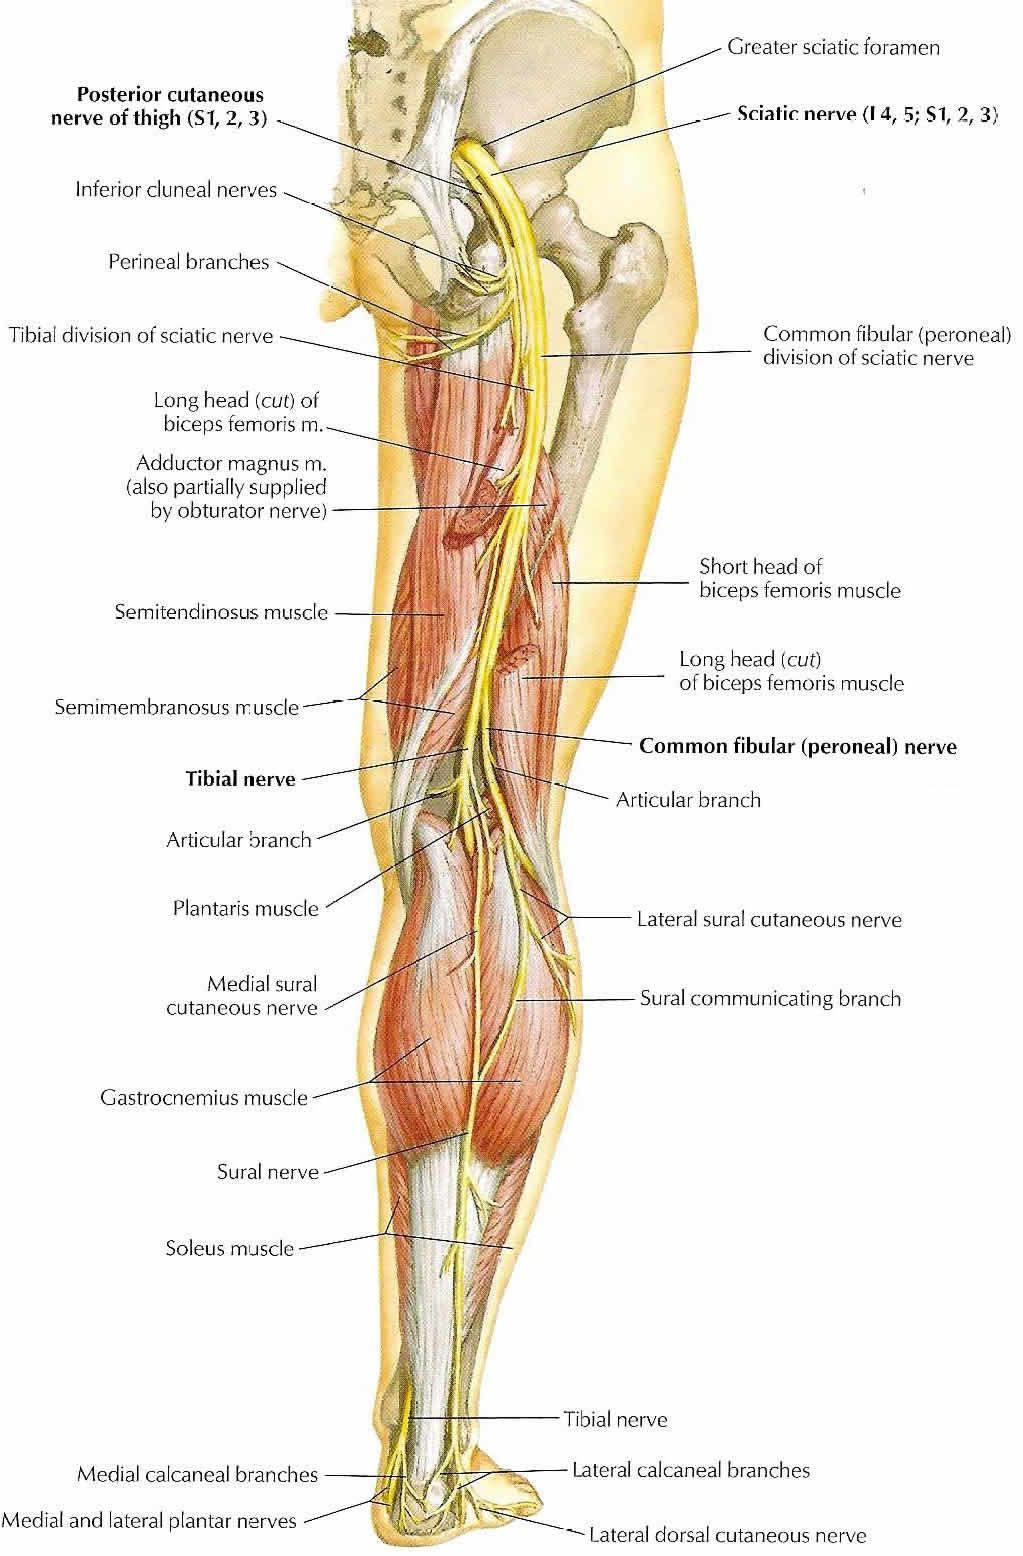 Lower Leg Nerve Diagram L293d Motor Driver Circuit In Www Mauriciolemus Com Nerves Human Anatomy Organs Sciatic Sciatica Rh Pinterest